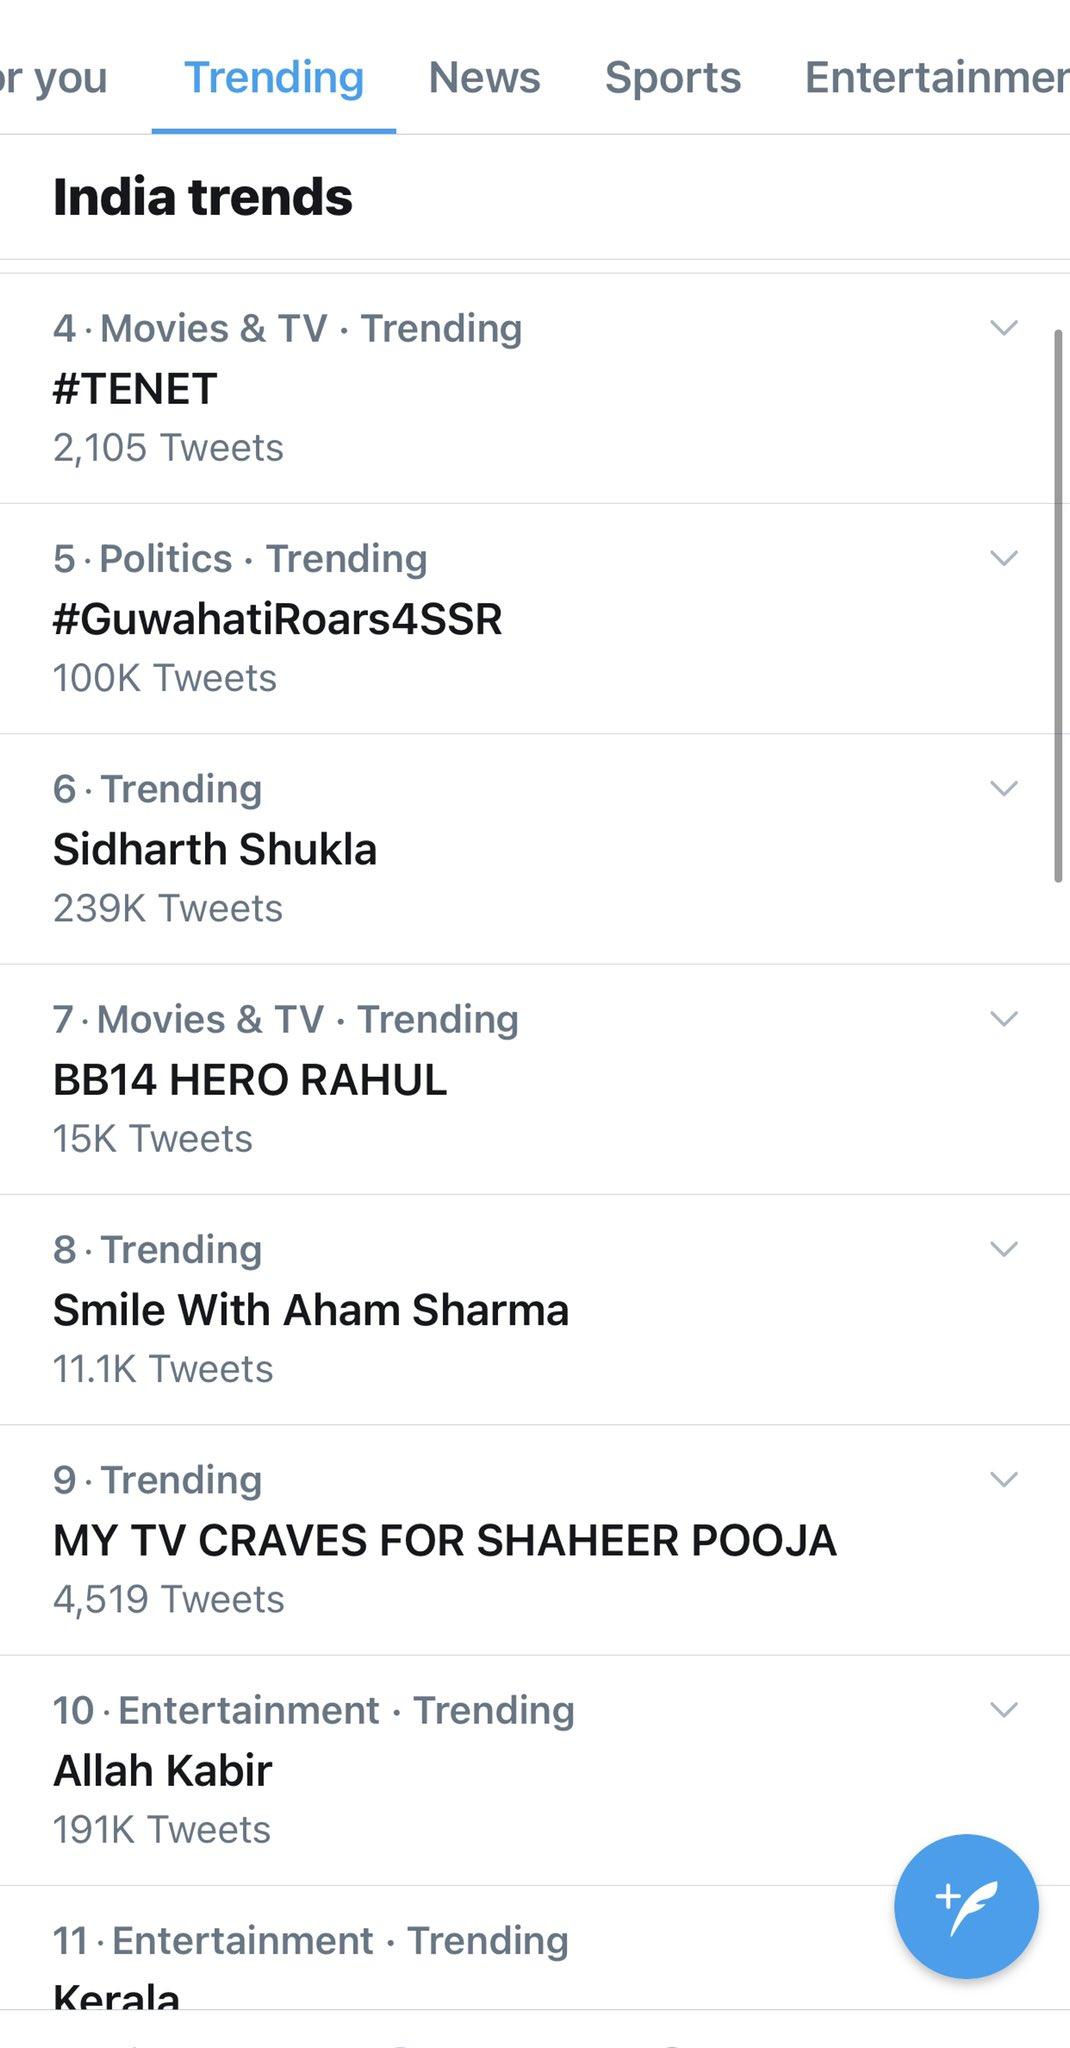 BB14 HERO RAHUL Photo,BB14 HERO RAHUL Twitter Trend : Most Popular Tweets